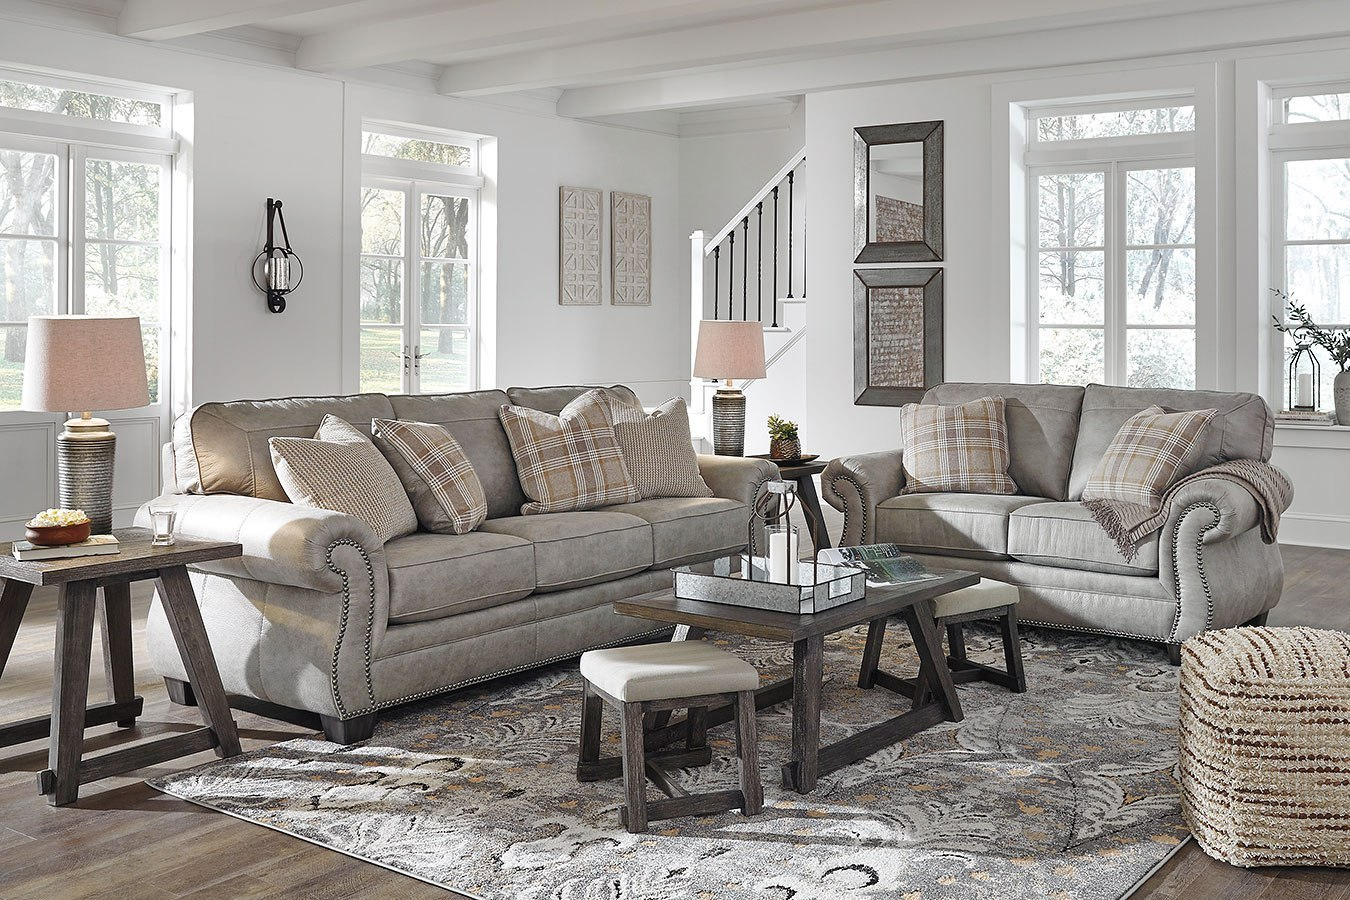 Olsberg Steel Living Room Set by Signature Design by Ashley ...